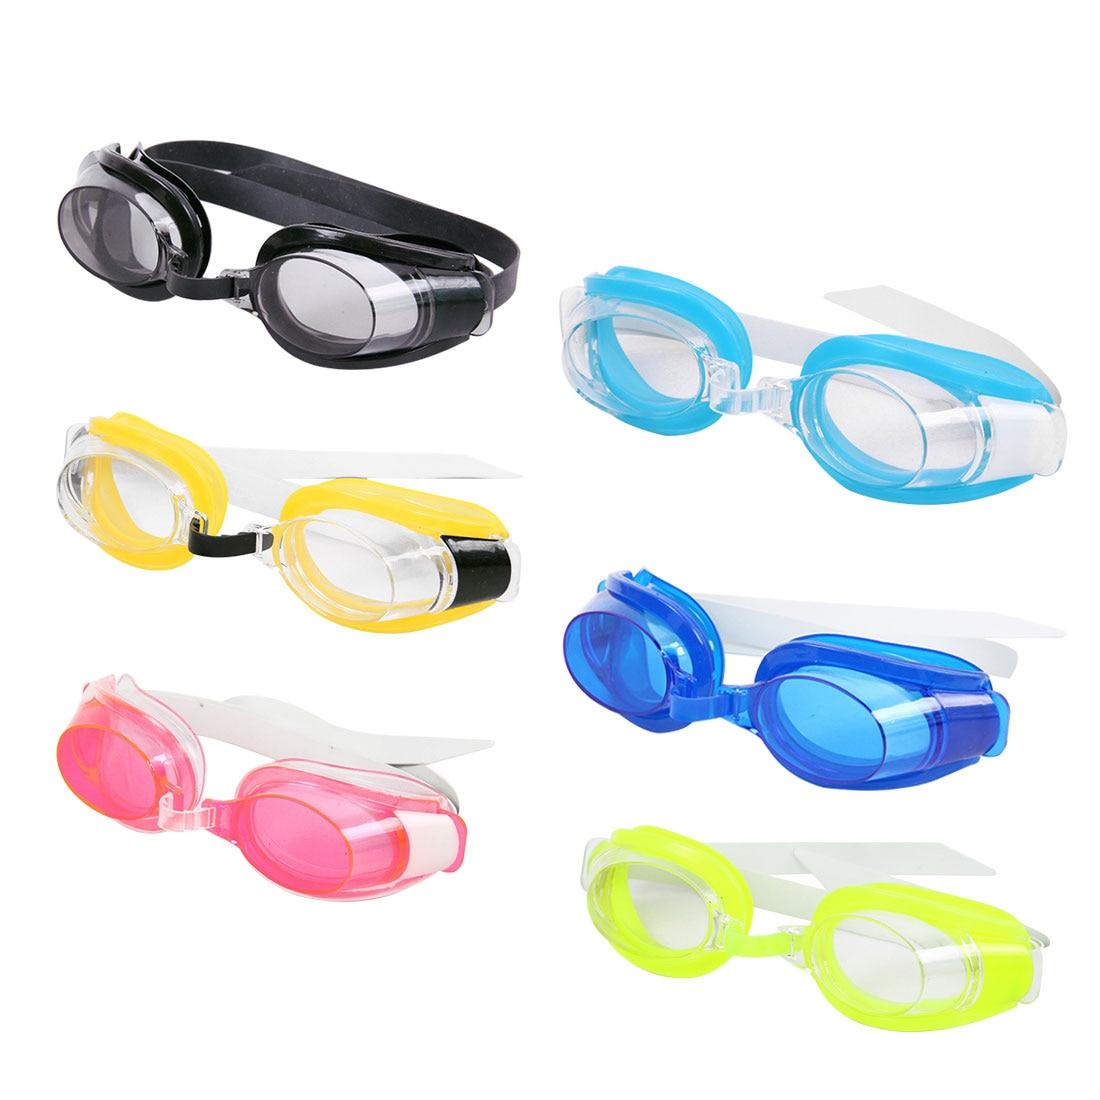 kids glasses Waterproof Anti fog Swimming Glasses Outdoor Sports Swimming Pool Eyewear & Ear Plugs Nose Clip Random Color